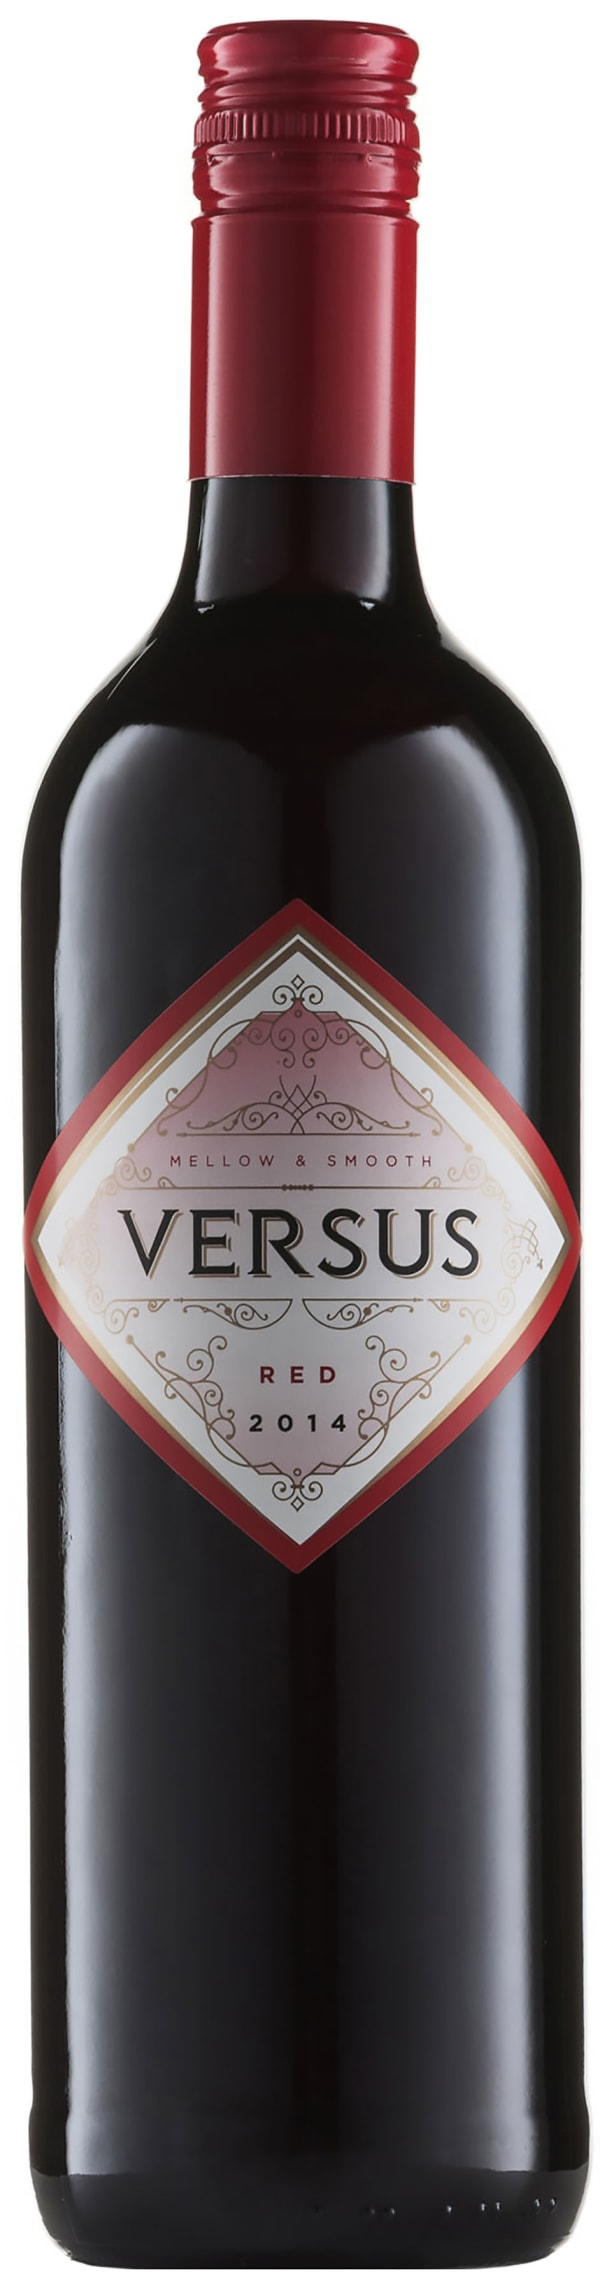 Versus Red 2014